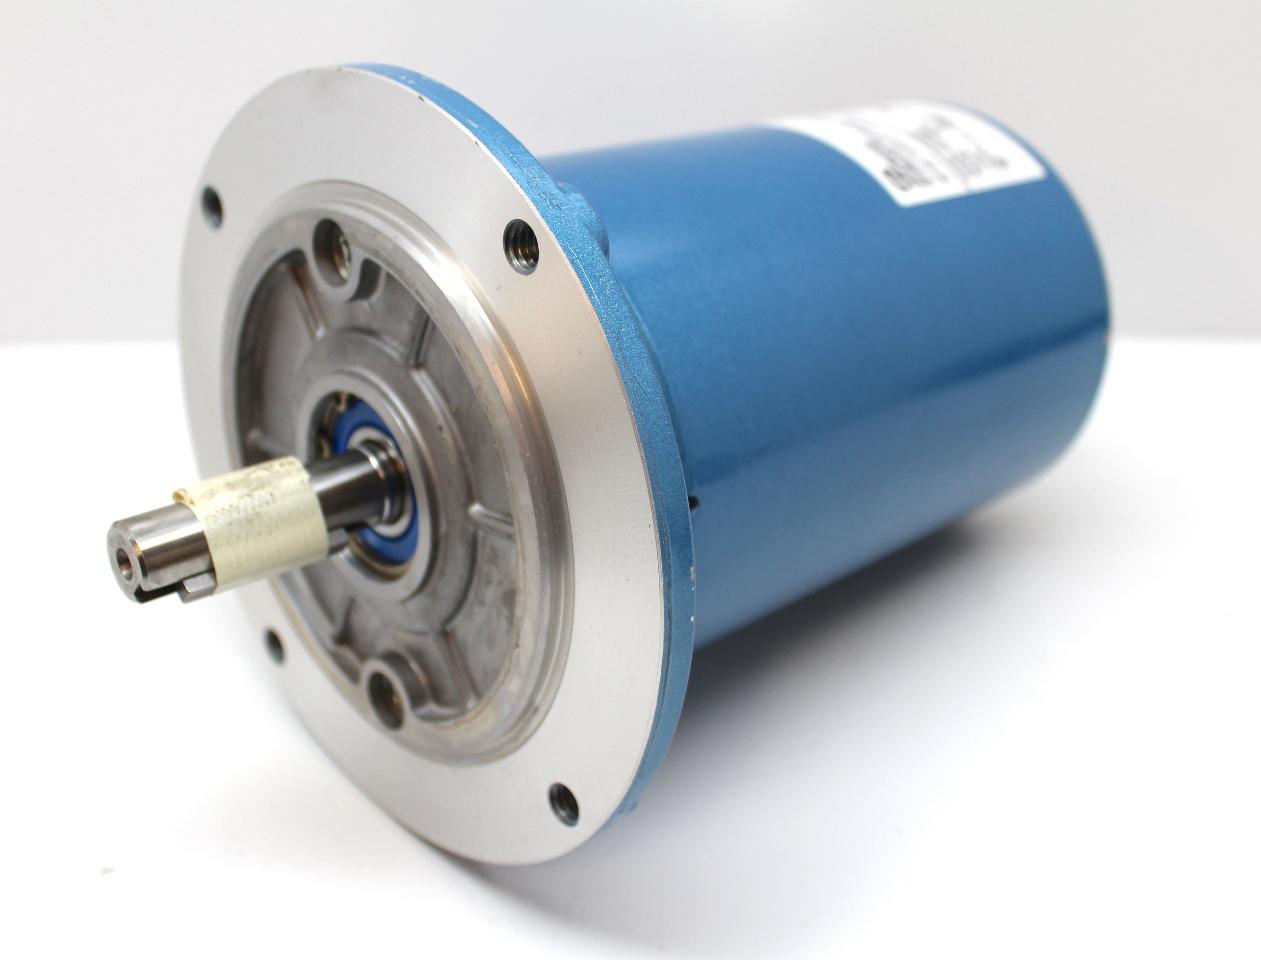 Pacific Scientific Ba3624 7045 56c Dc Motor 24v 1200 Rpm 1 3hp 13 Amp 56c New